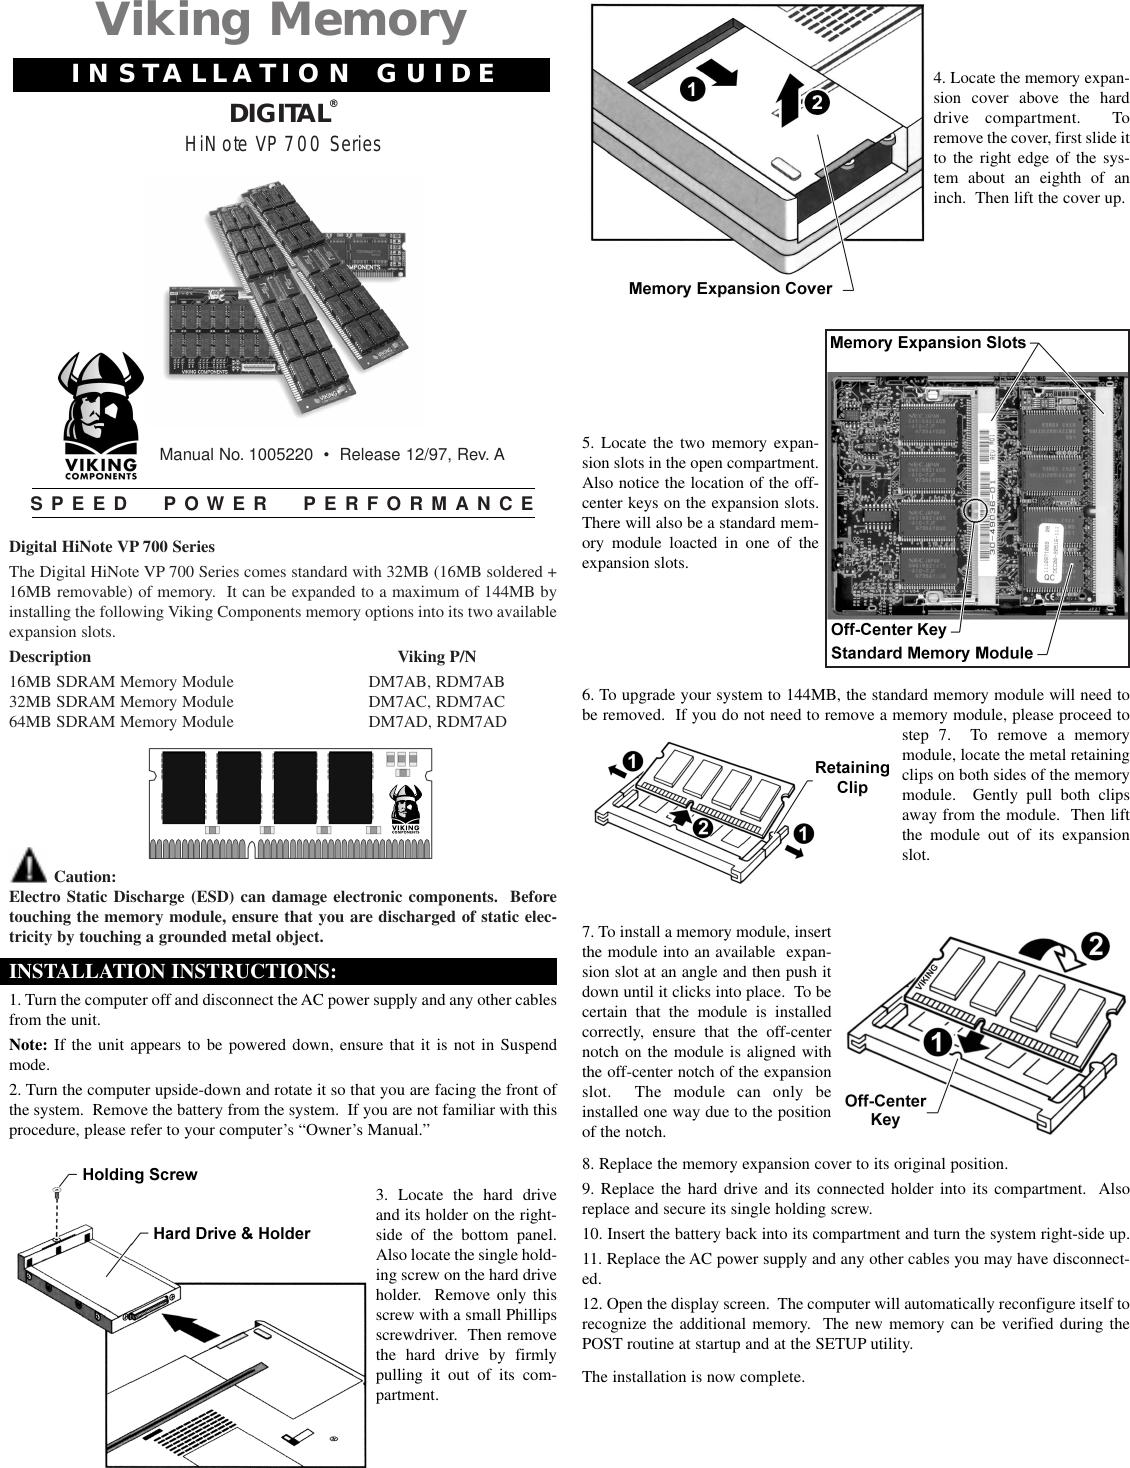 Viking Interworks Dec Hinote Vp 700 Series Users Manual Digital Phillips 7 Way Wiring Diagram Memory Installation Pdf